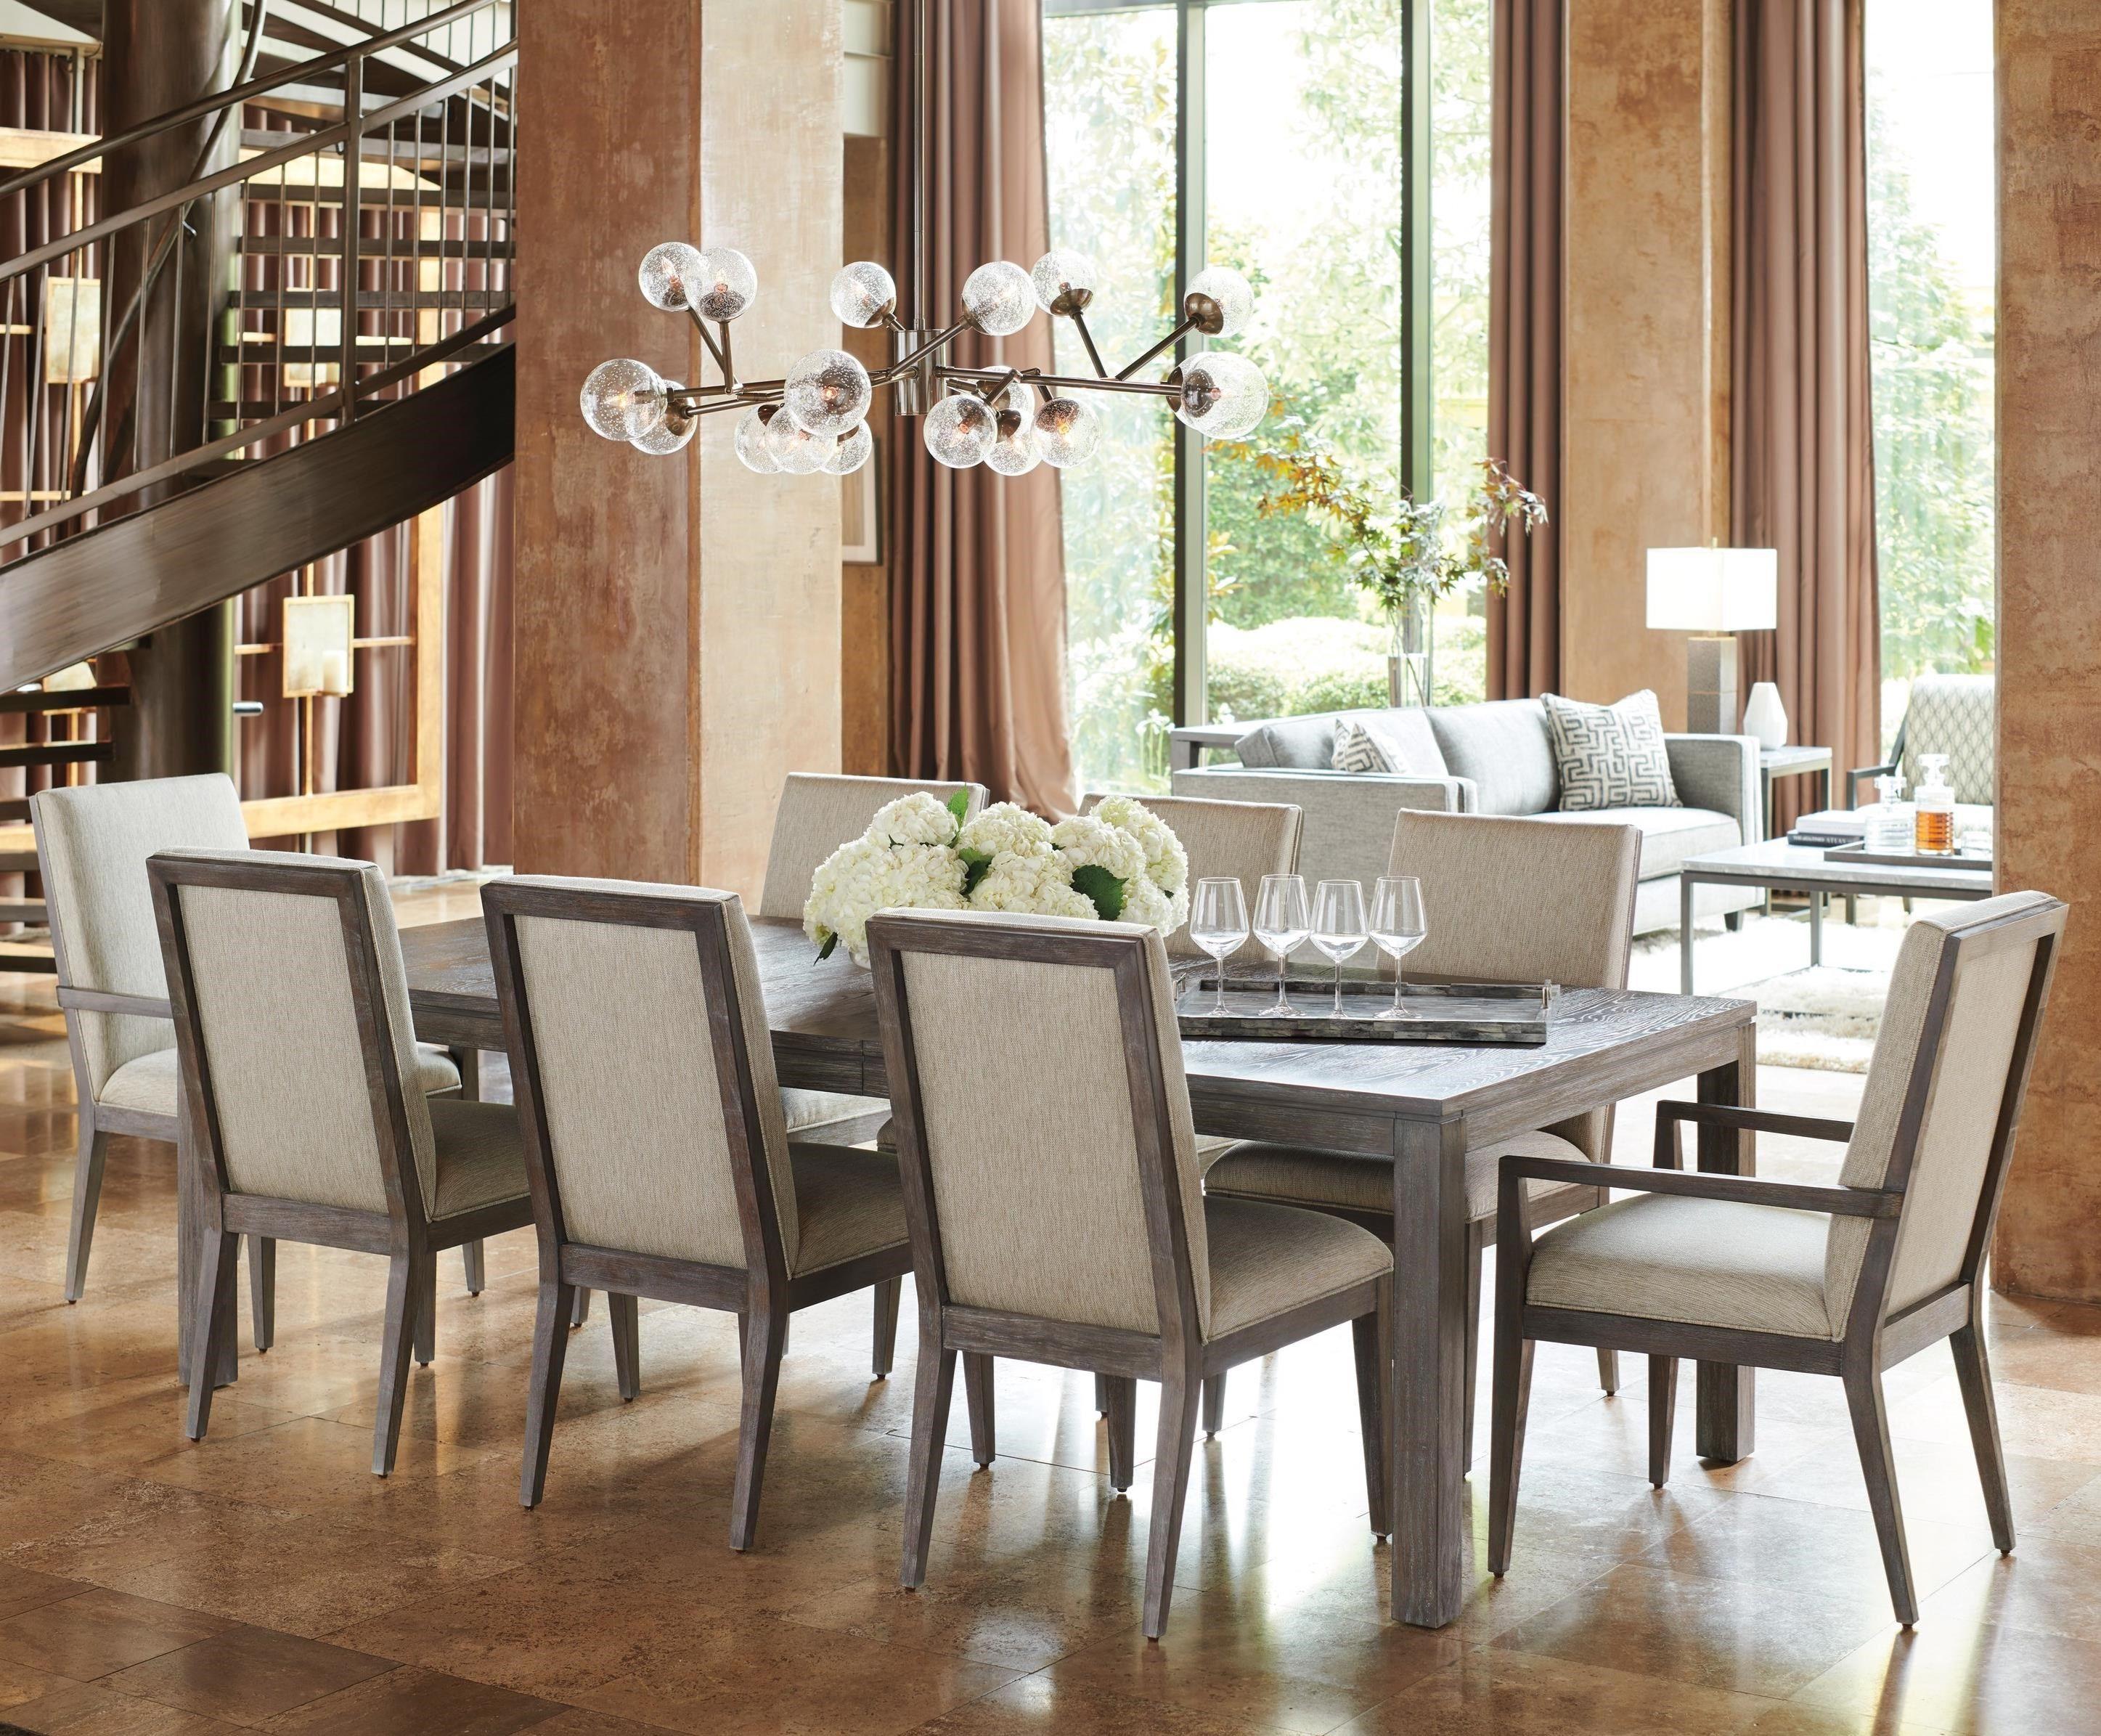 Costco Sale Bayside Furnishings 9 Pc Dining Set 699 99 Bayside